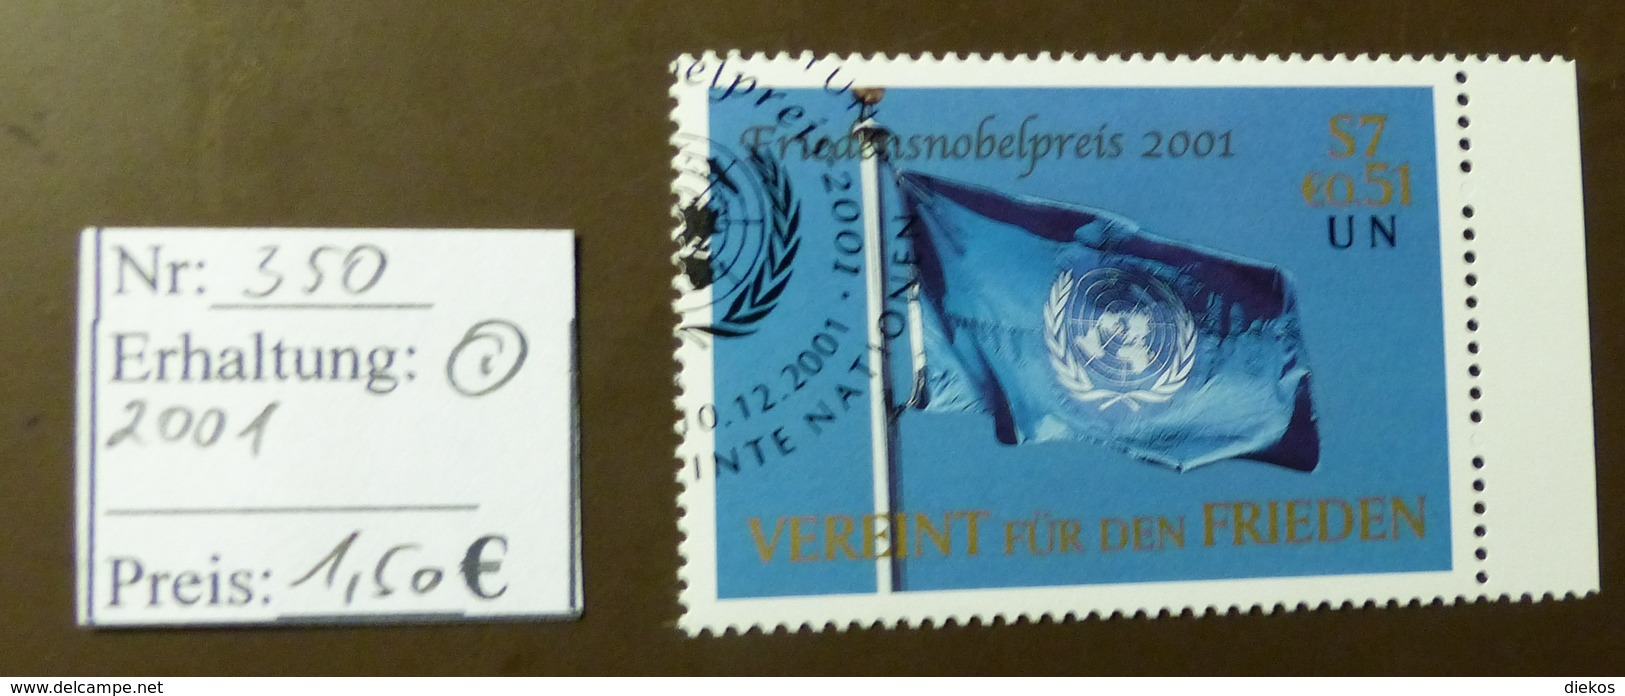 UNO Wien Michel Nr:  350  Gestempelt Used     #4975 - Wien - Internationales Zentrum